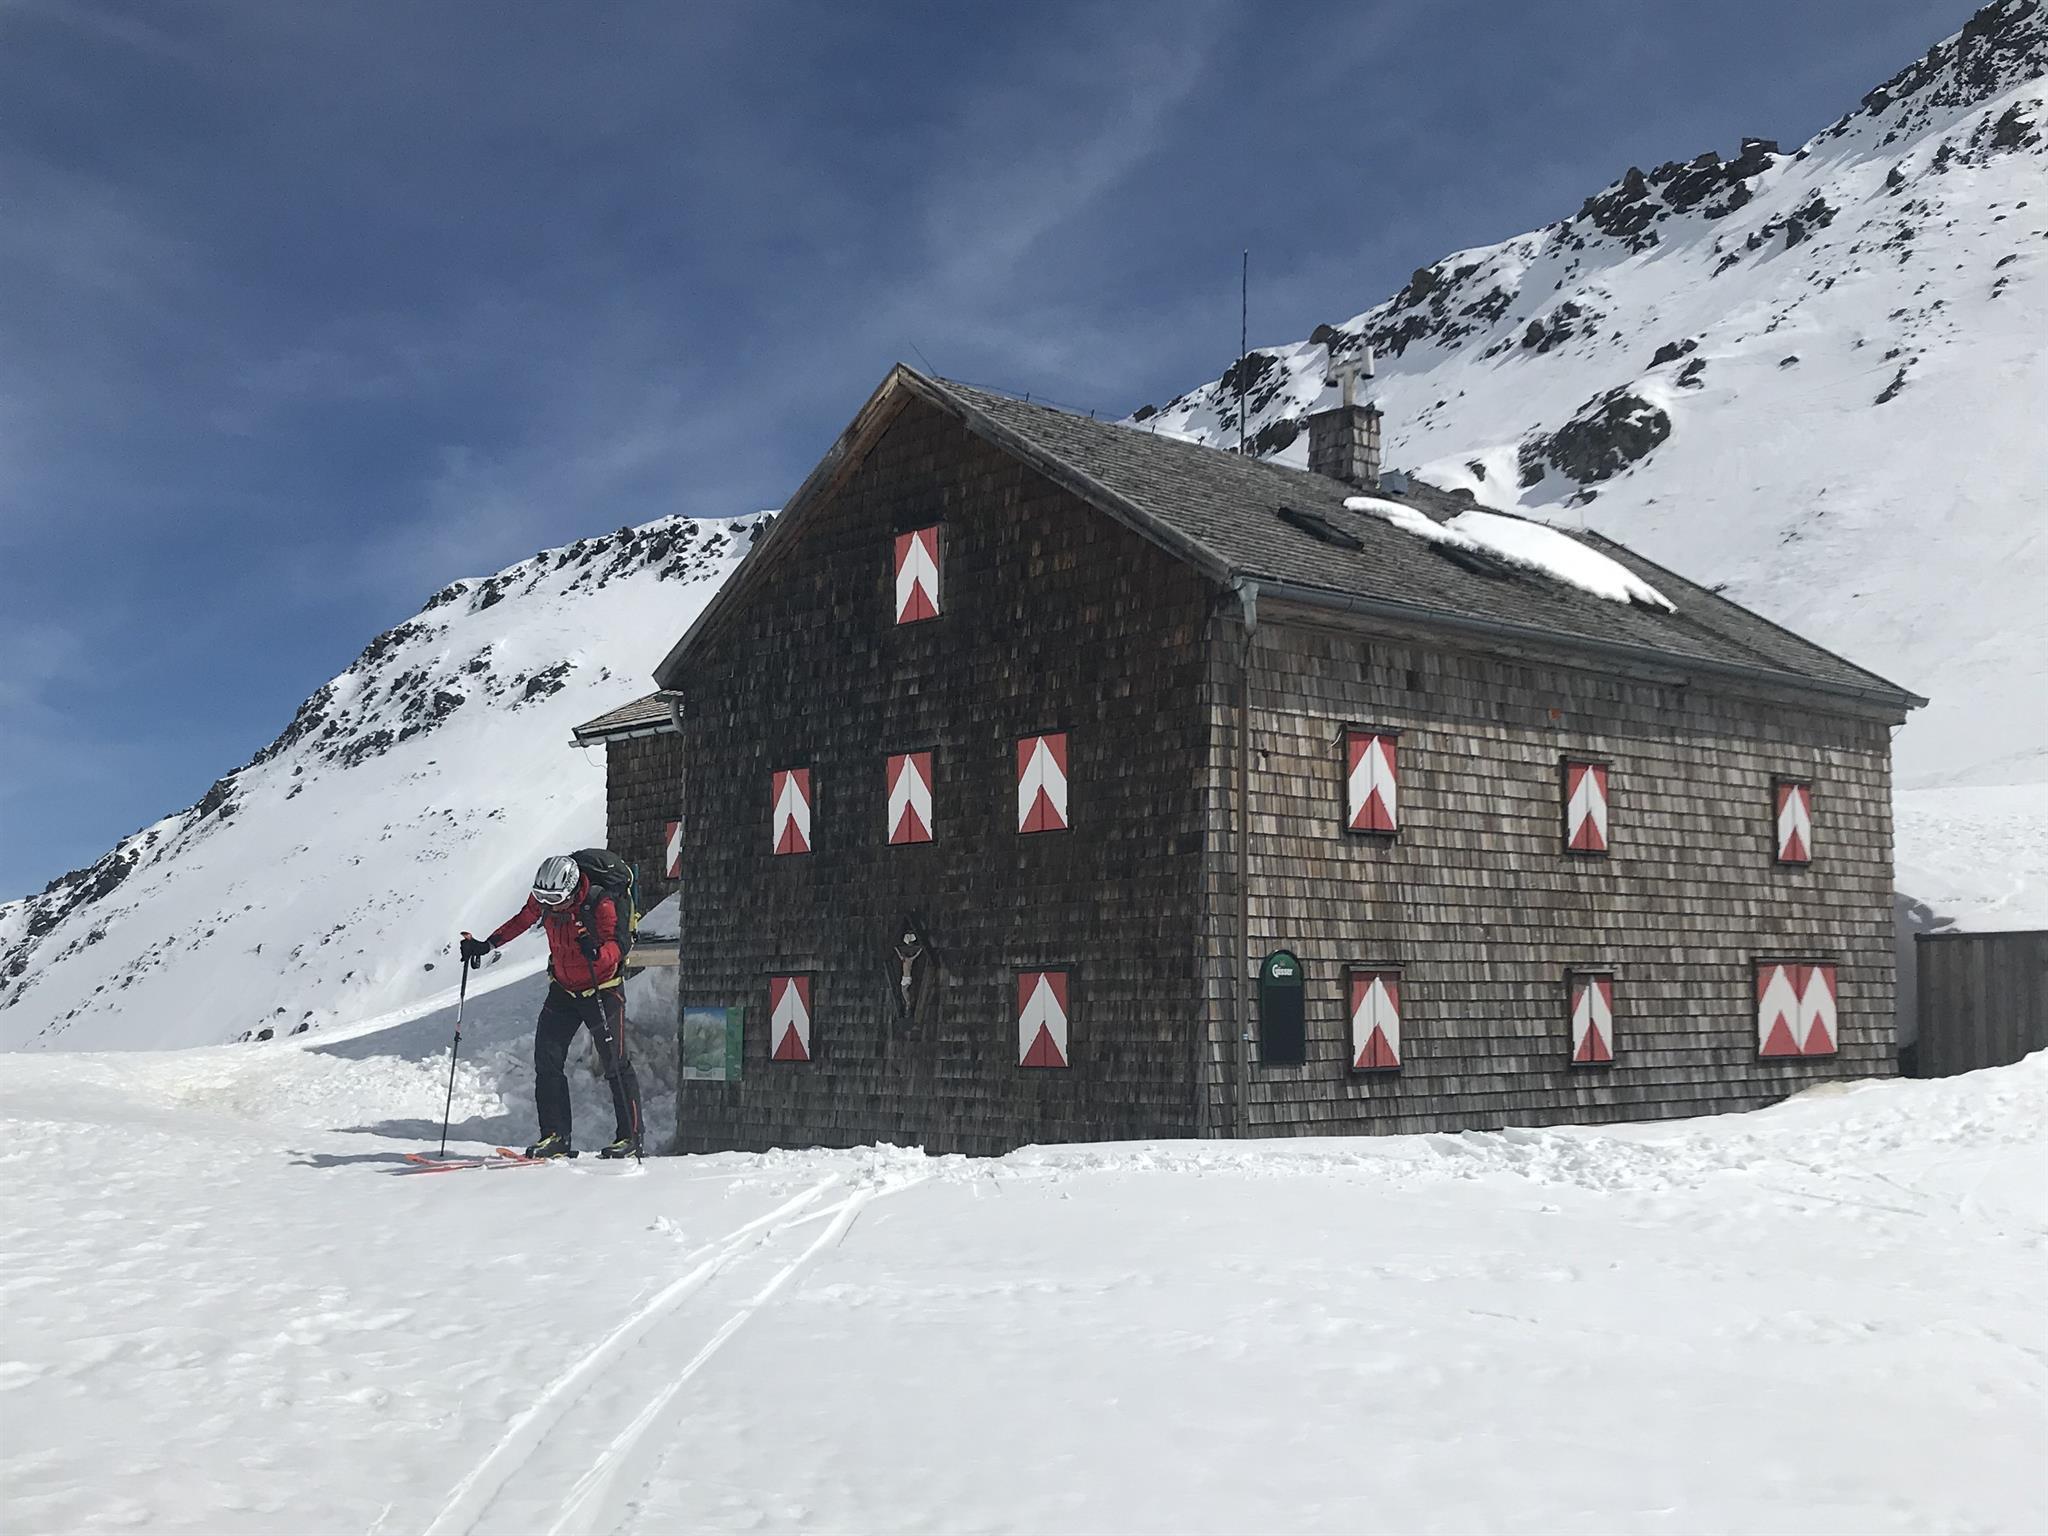 Glorerhuette-Skitour.jpg